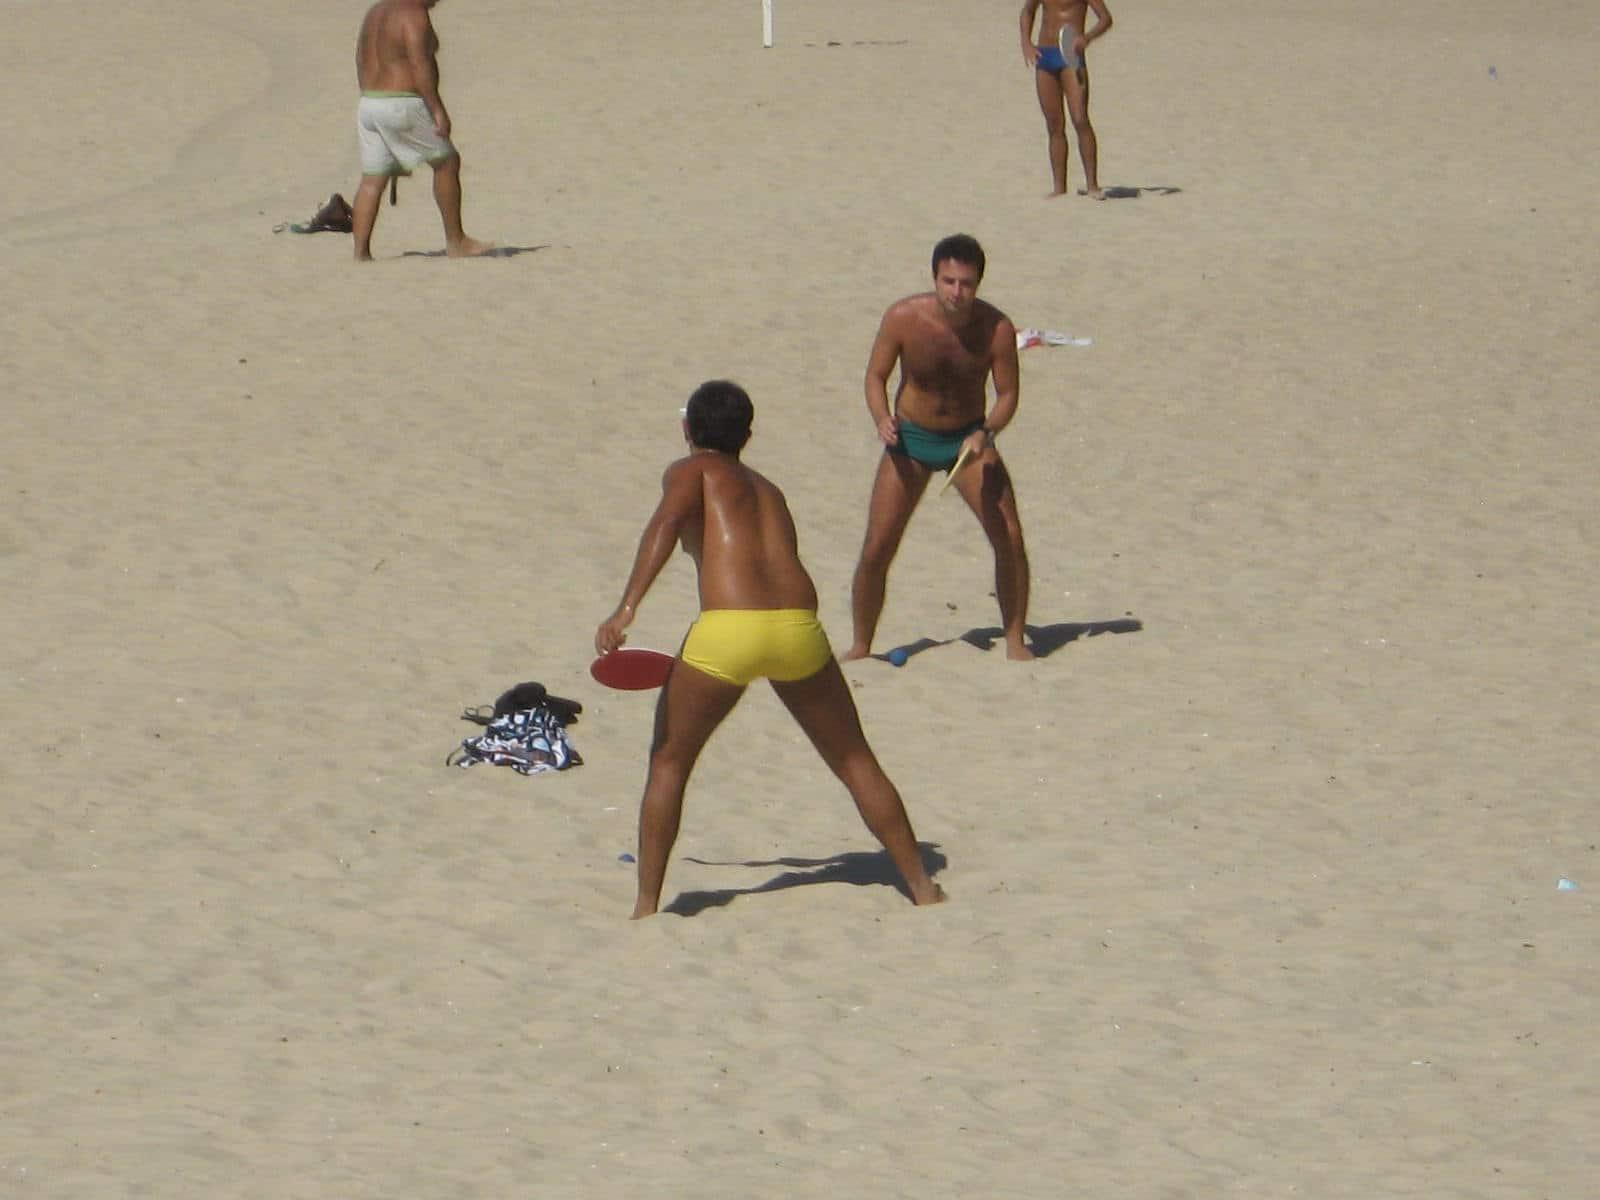 Frescobol-beach-game